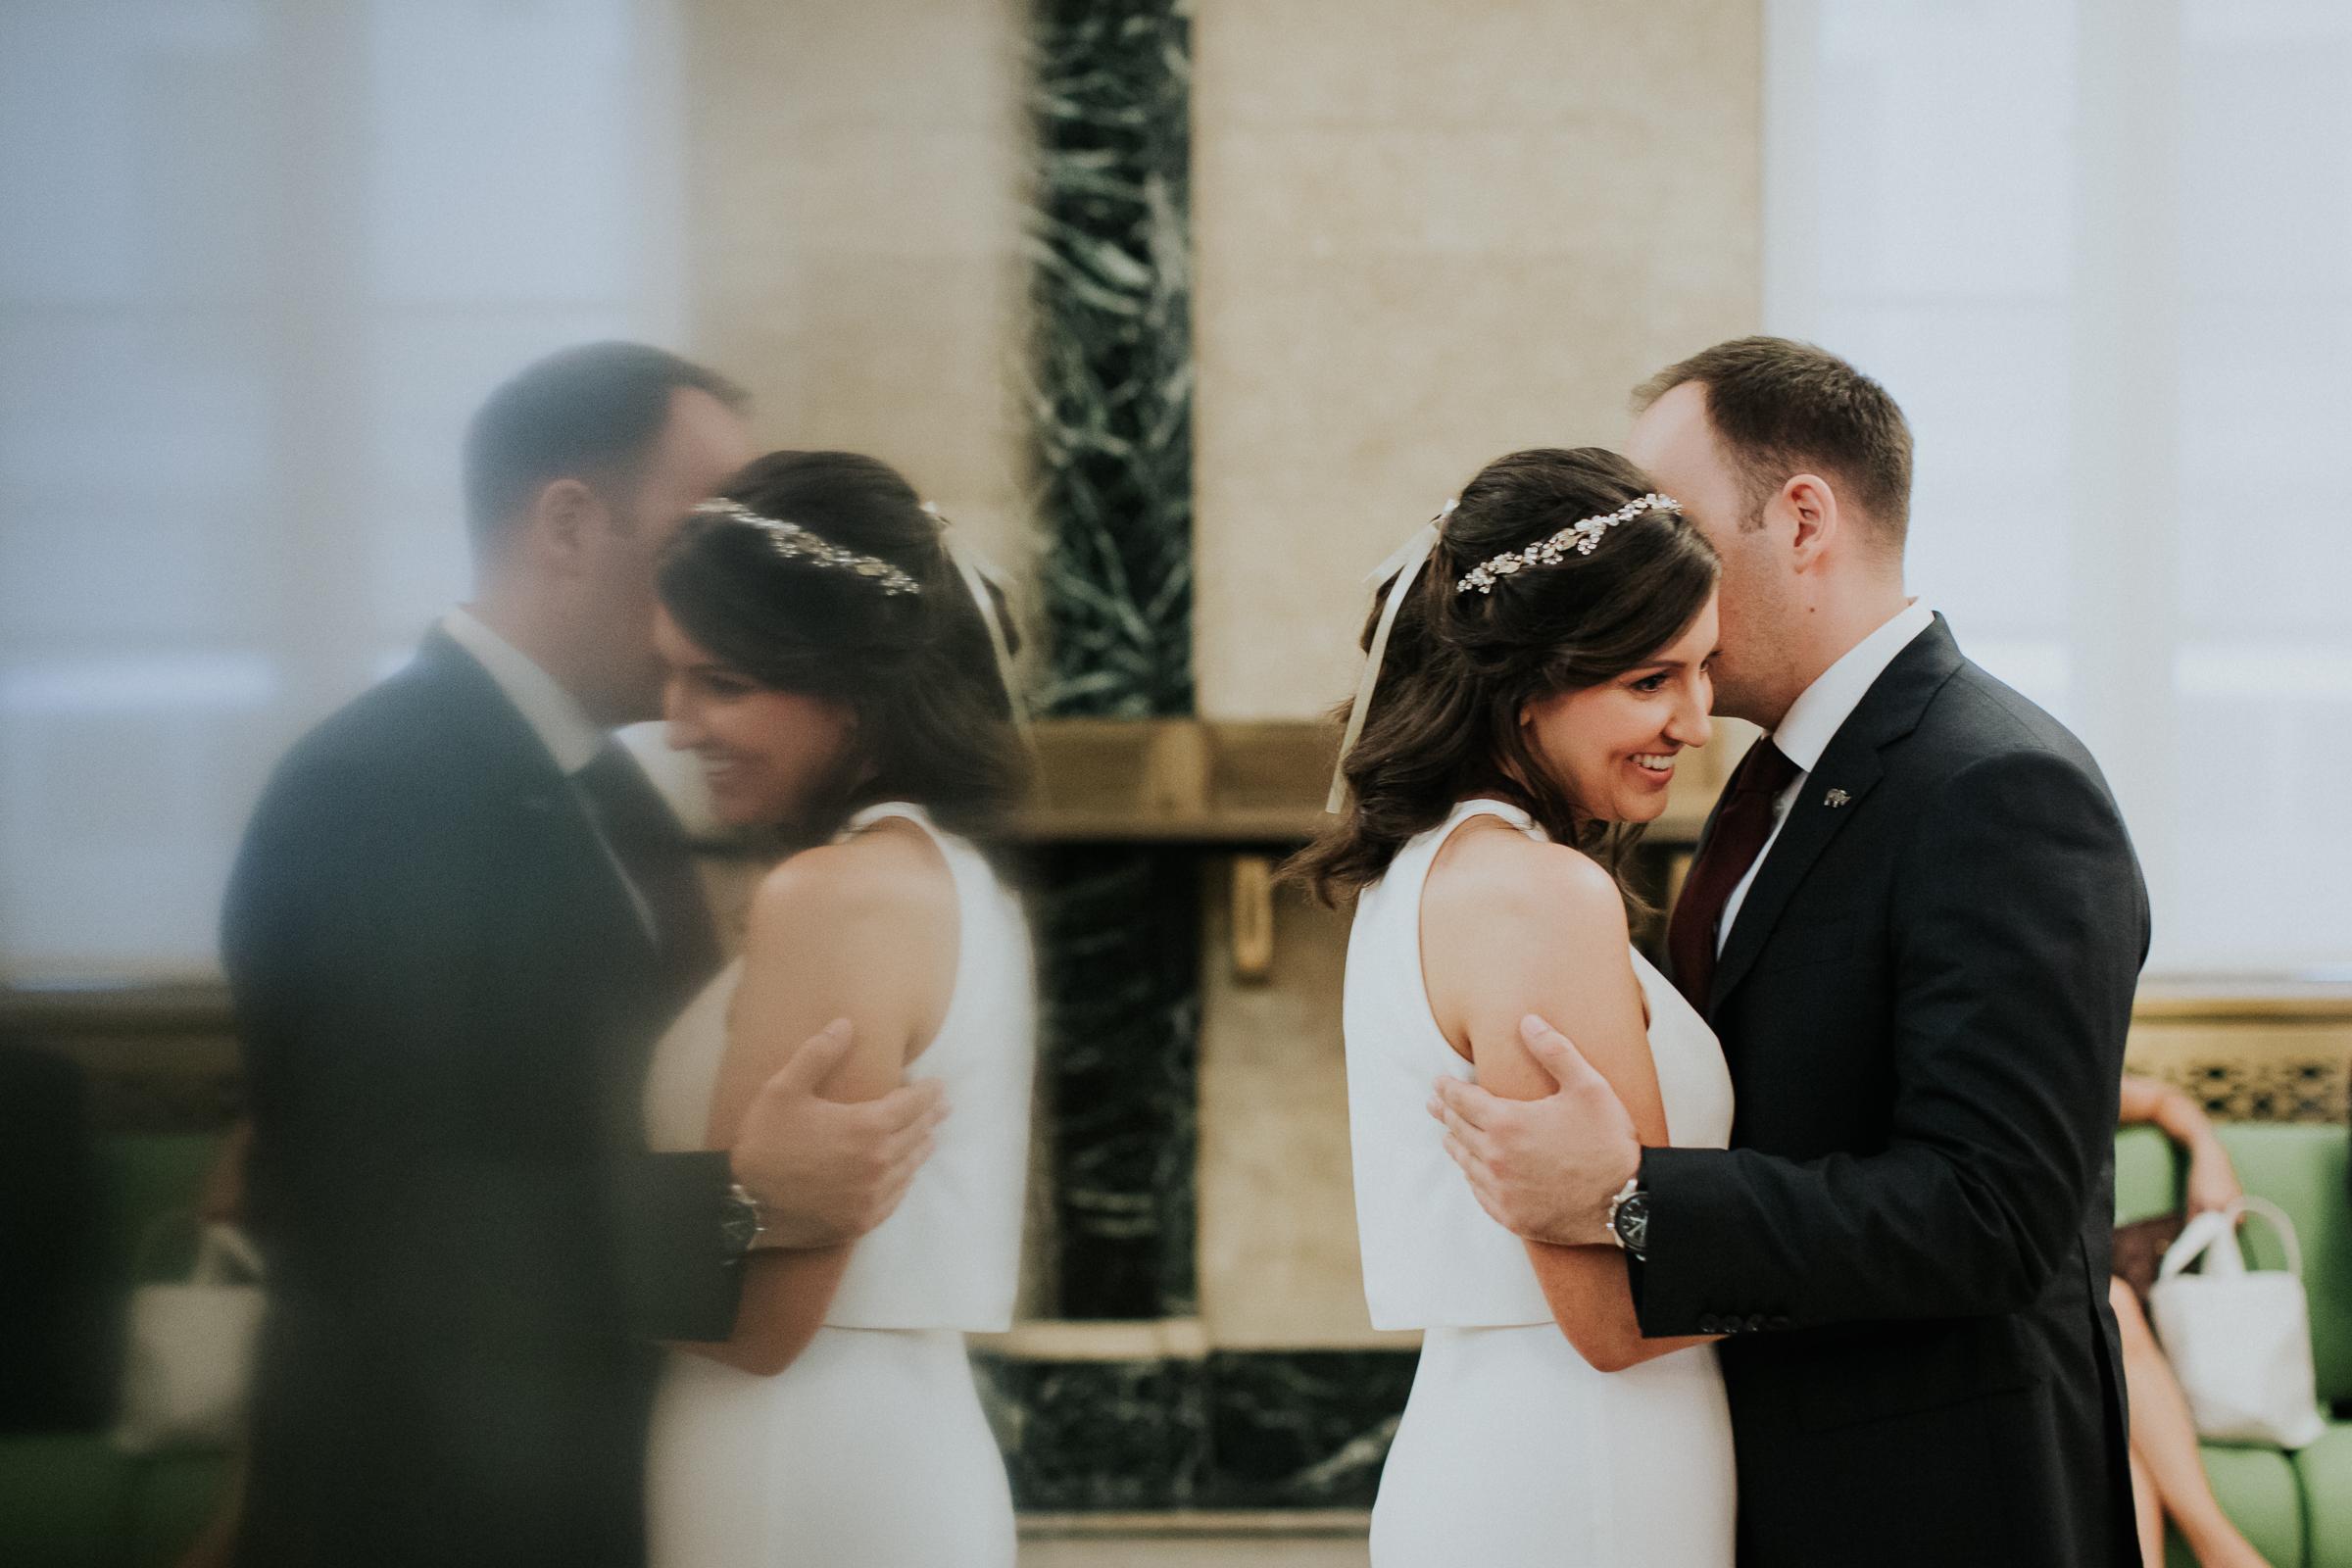 Casa-Apicii-Intimate-Wedding-City-Hall-Elopement-New-York-Documentary-Wedding-Photographer-7.jpg